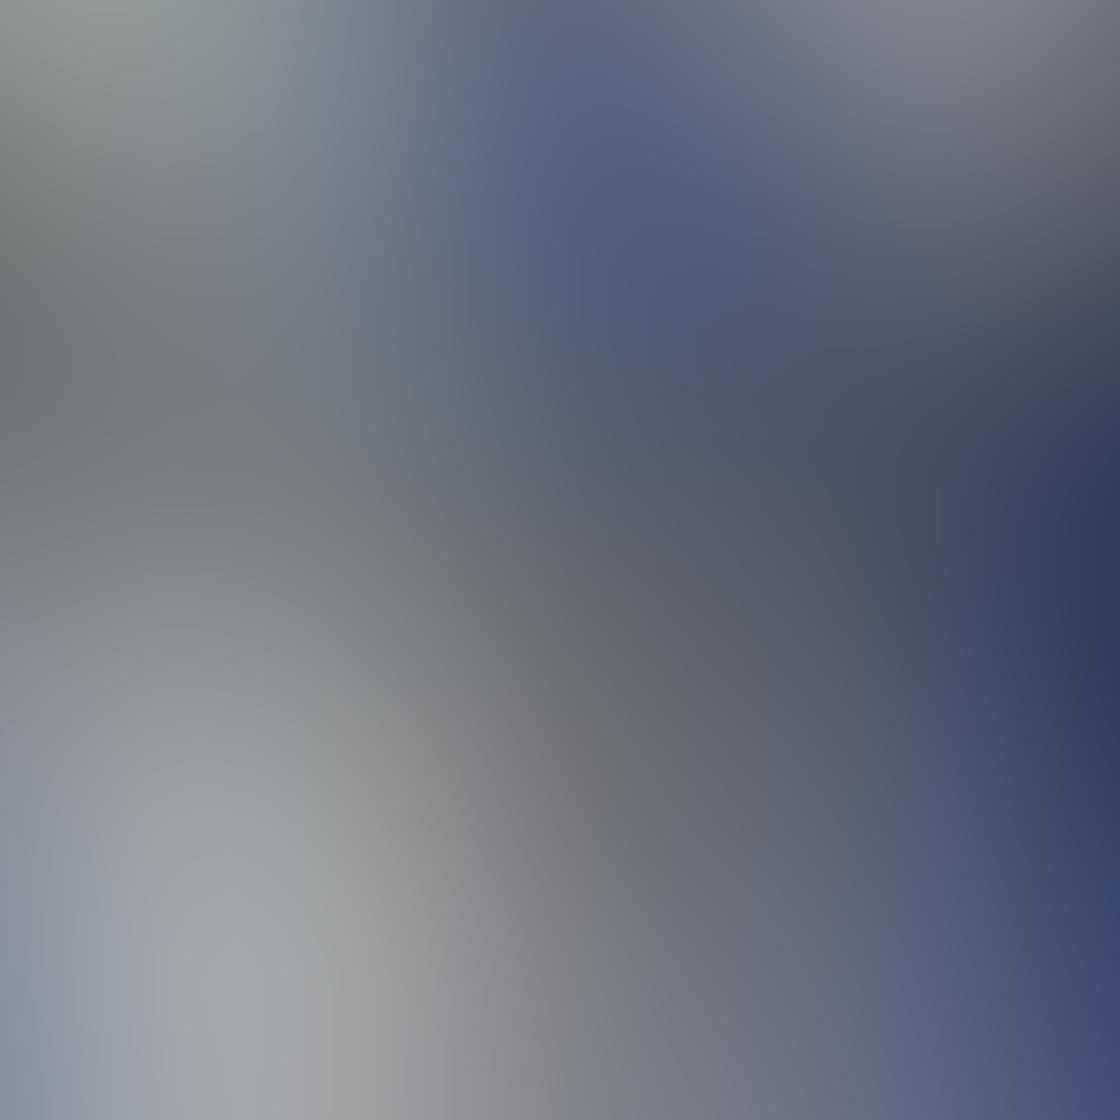 iPhone Angle Photo 27